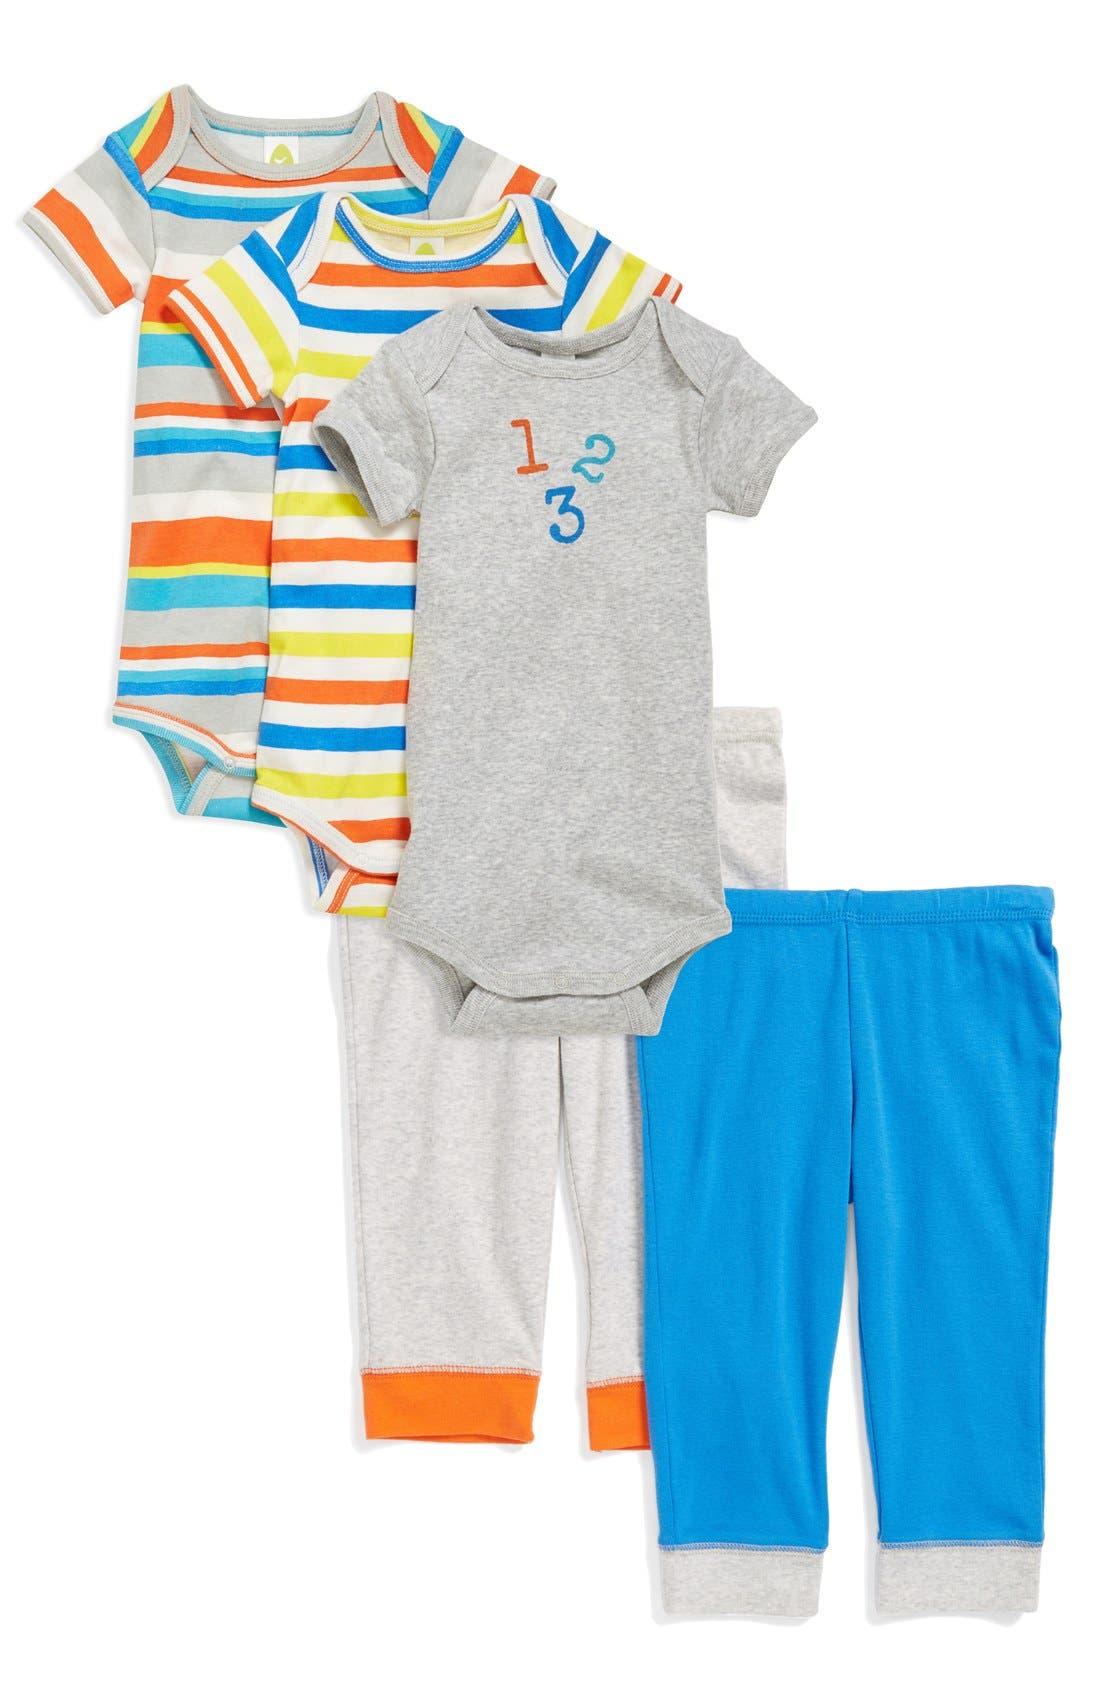 Alternate Image 2  - Stem Baby Colorblock Organic Cotton Pants (Set of 2) (Baby Boys) (Nordstrom Exclusive)